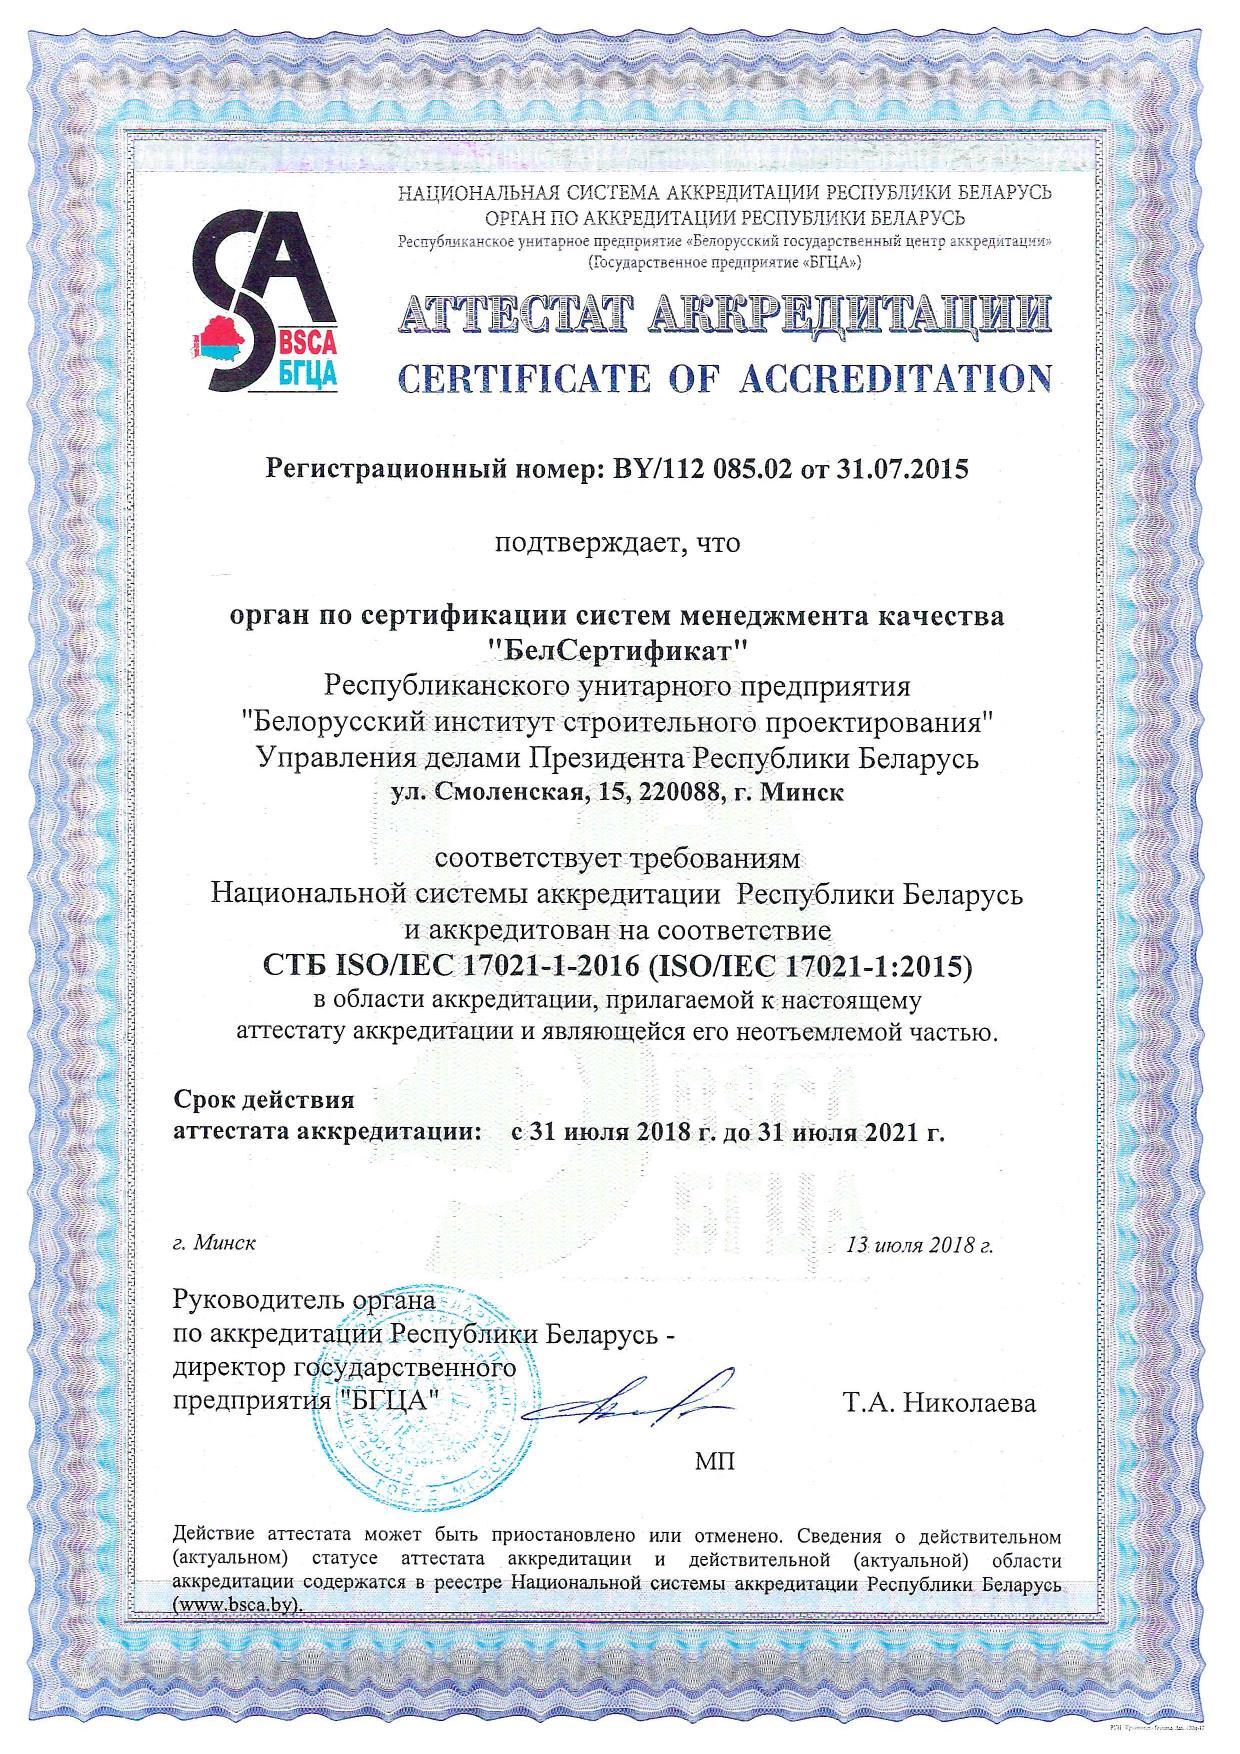 11 Аттестат аккредитации БГЦА по сертификации системы менеджмента качества